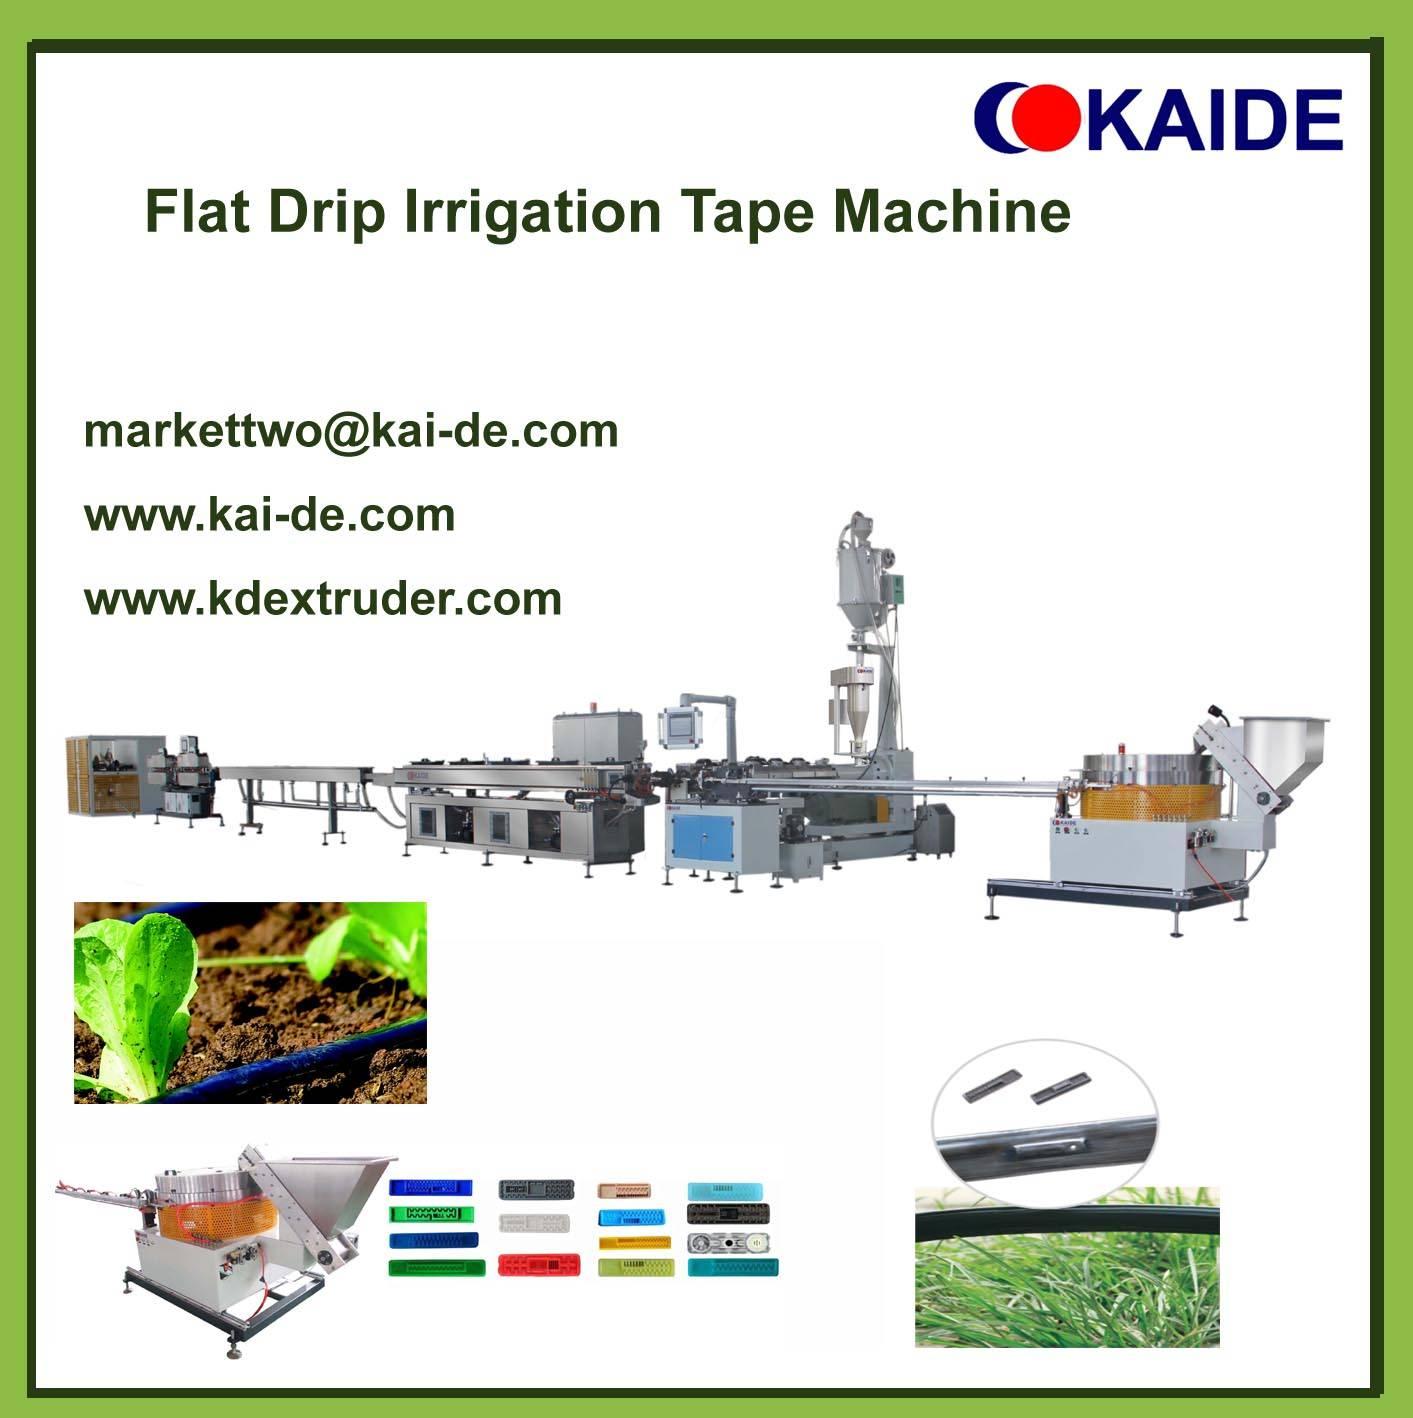 Flat Dripper Irrigation Tape Machine